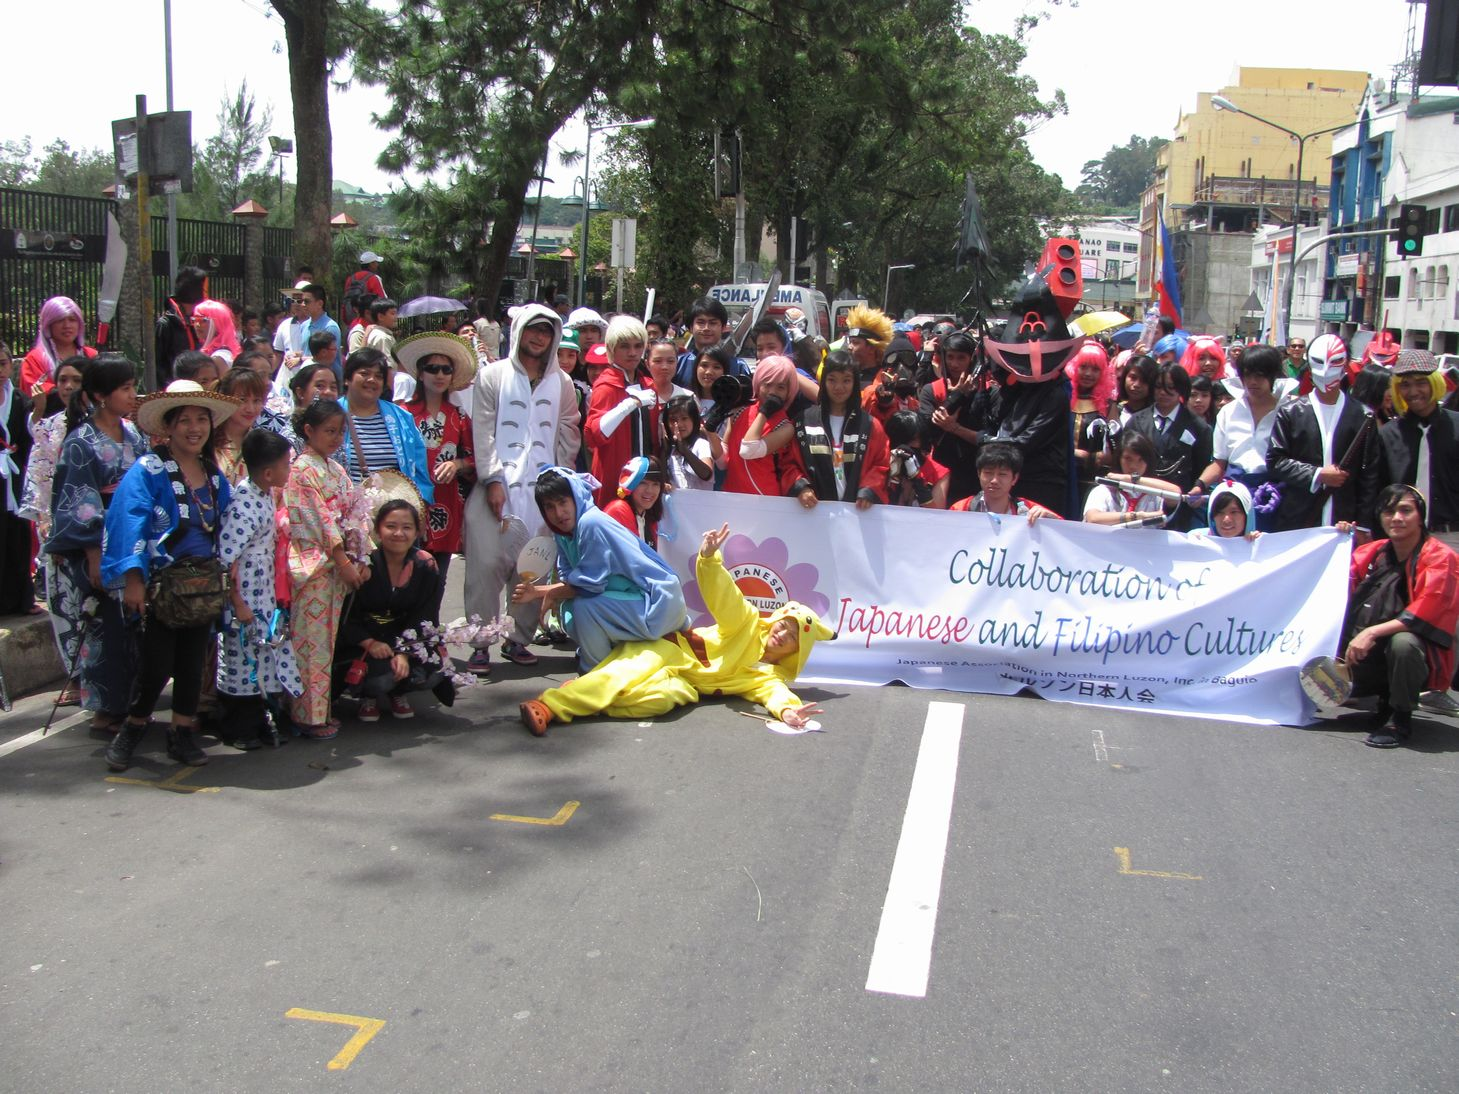 Baguio Day Parade 2013 フィリピン・バギオ市制104周年記念 コスプレ・パレード_a0109542_14501384.jpg